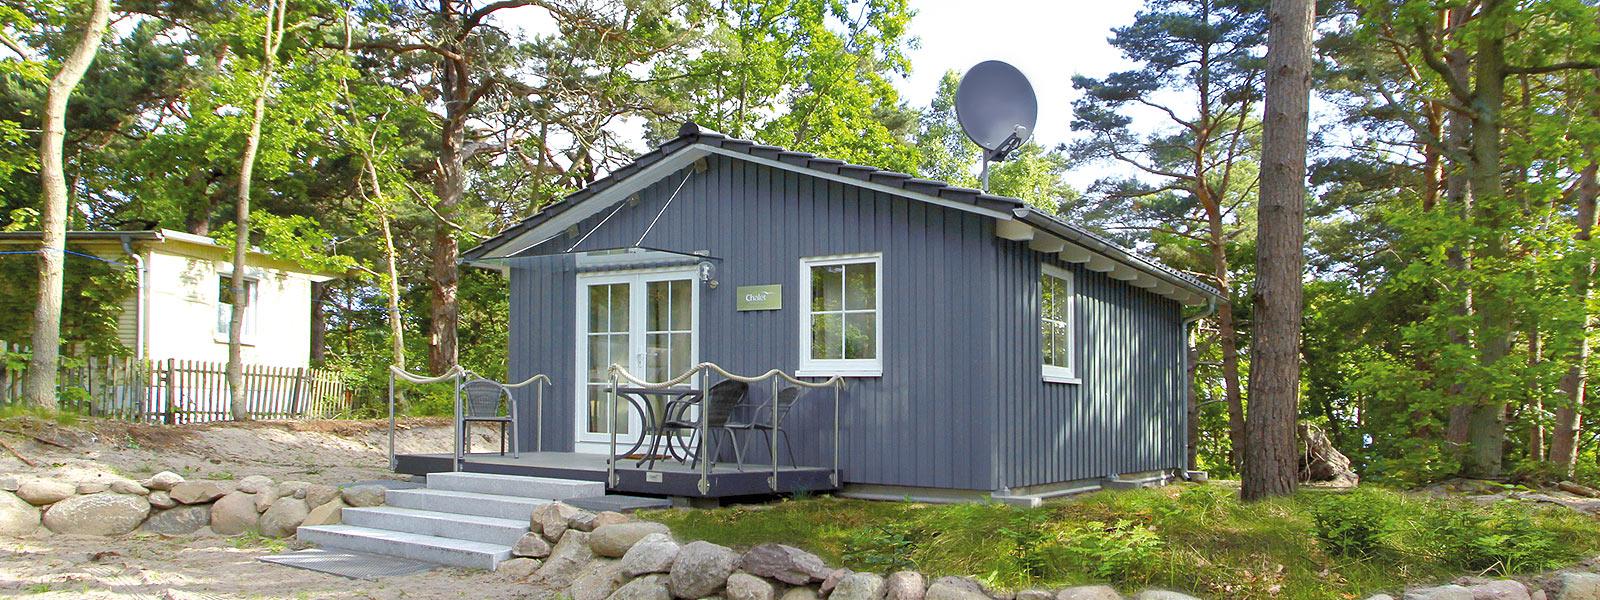 petit chalet das ferienhaus minihaus modulhaus. Black Bedroom Furniture Sets. Home Design Ideas